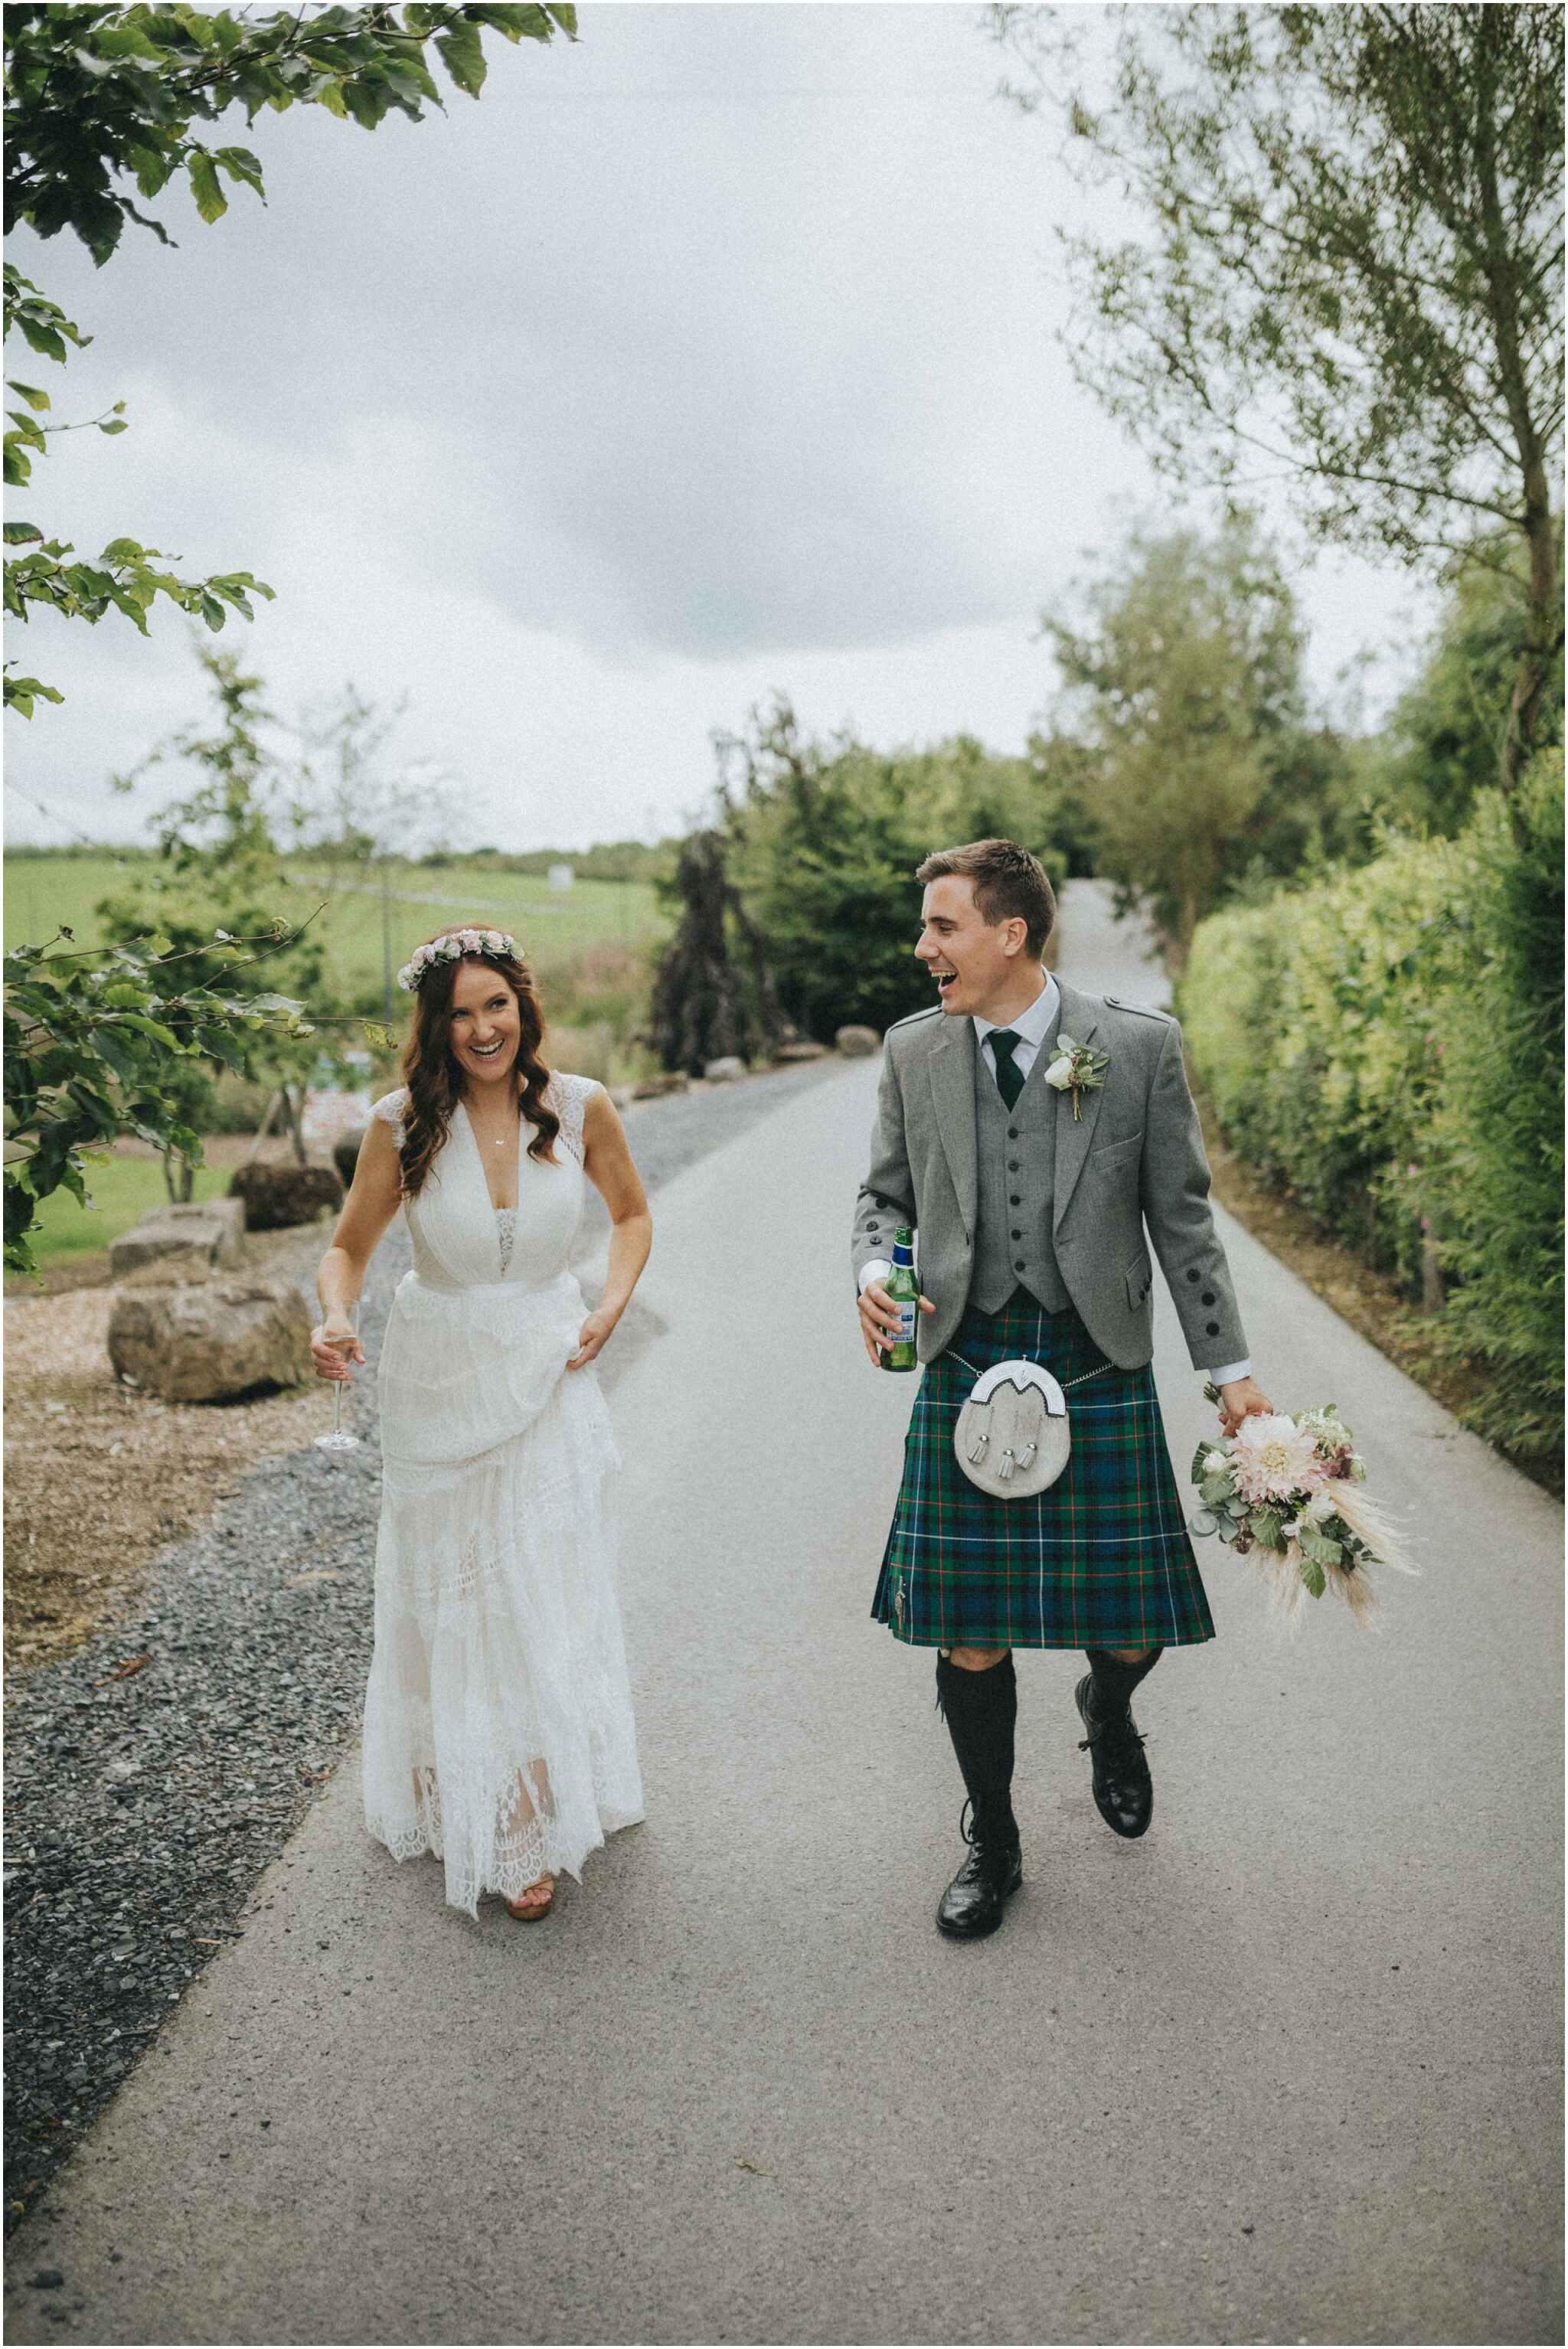 Fionnuala + Paul - Mount Druid Alternative Wedding 137